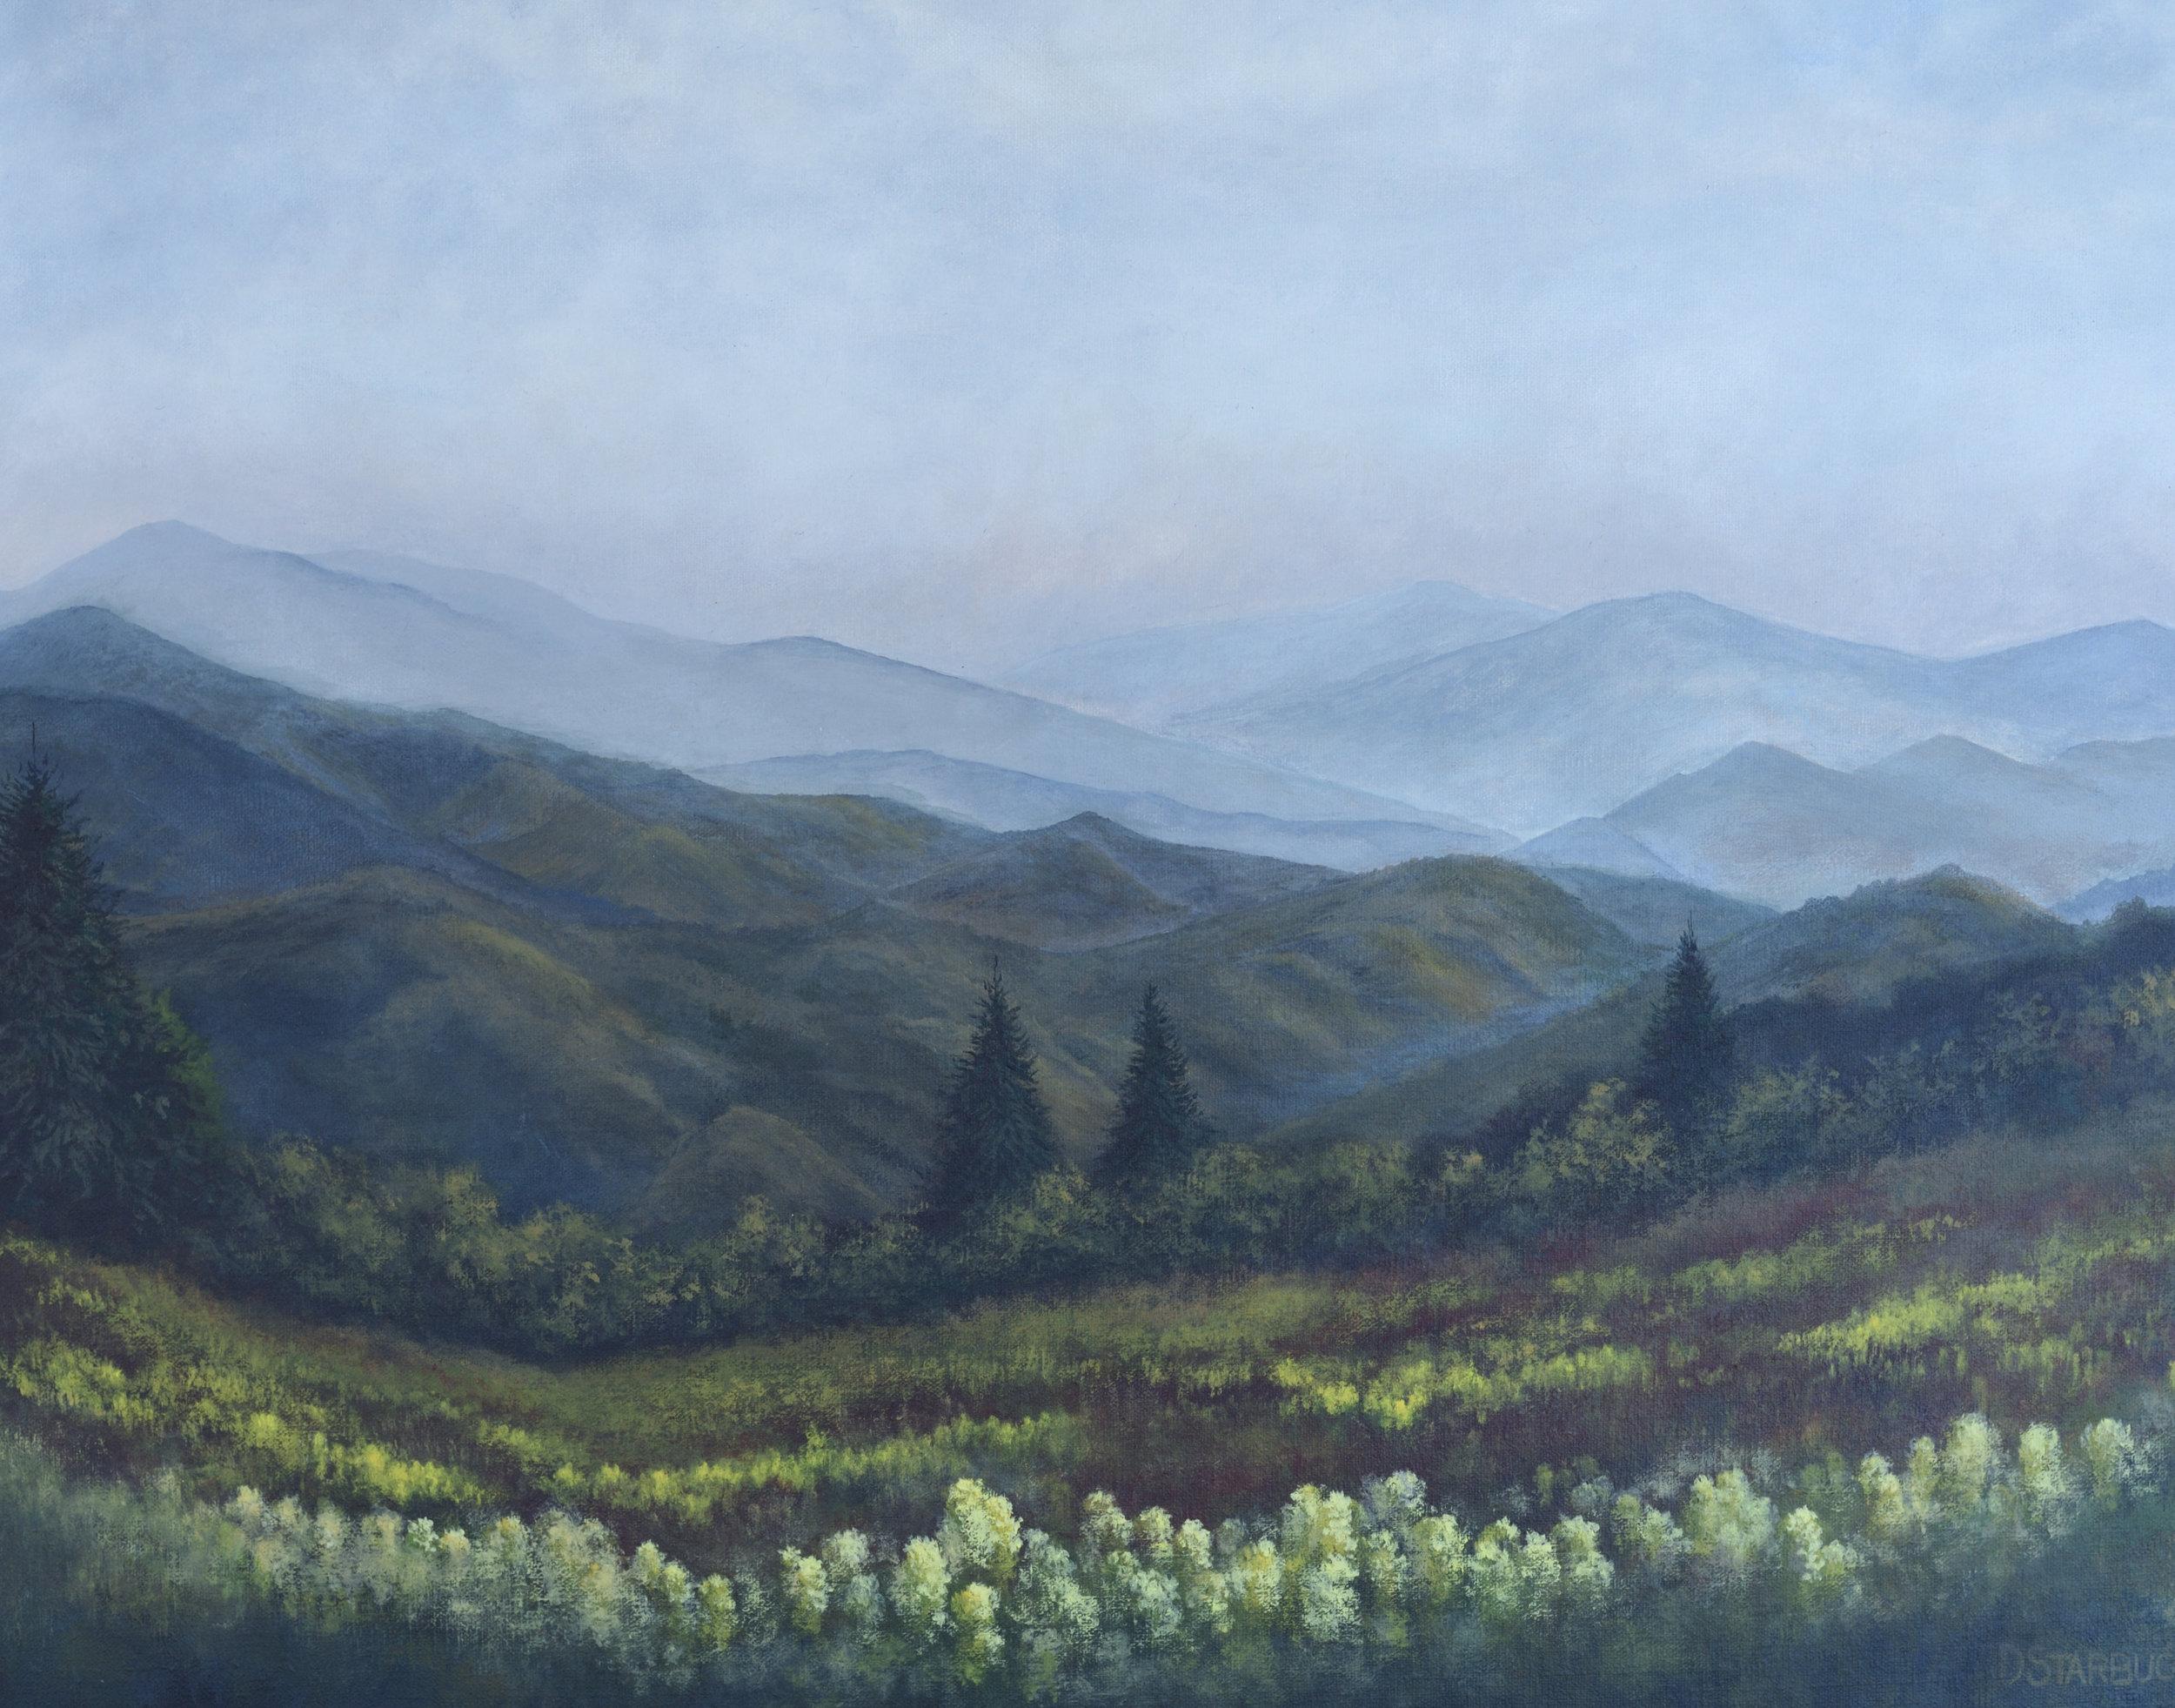 """Peace"" Blue Ridge Parkway, North Carolina  Original: Acrylic on Linen, 24"" x 18"""